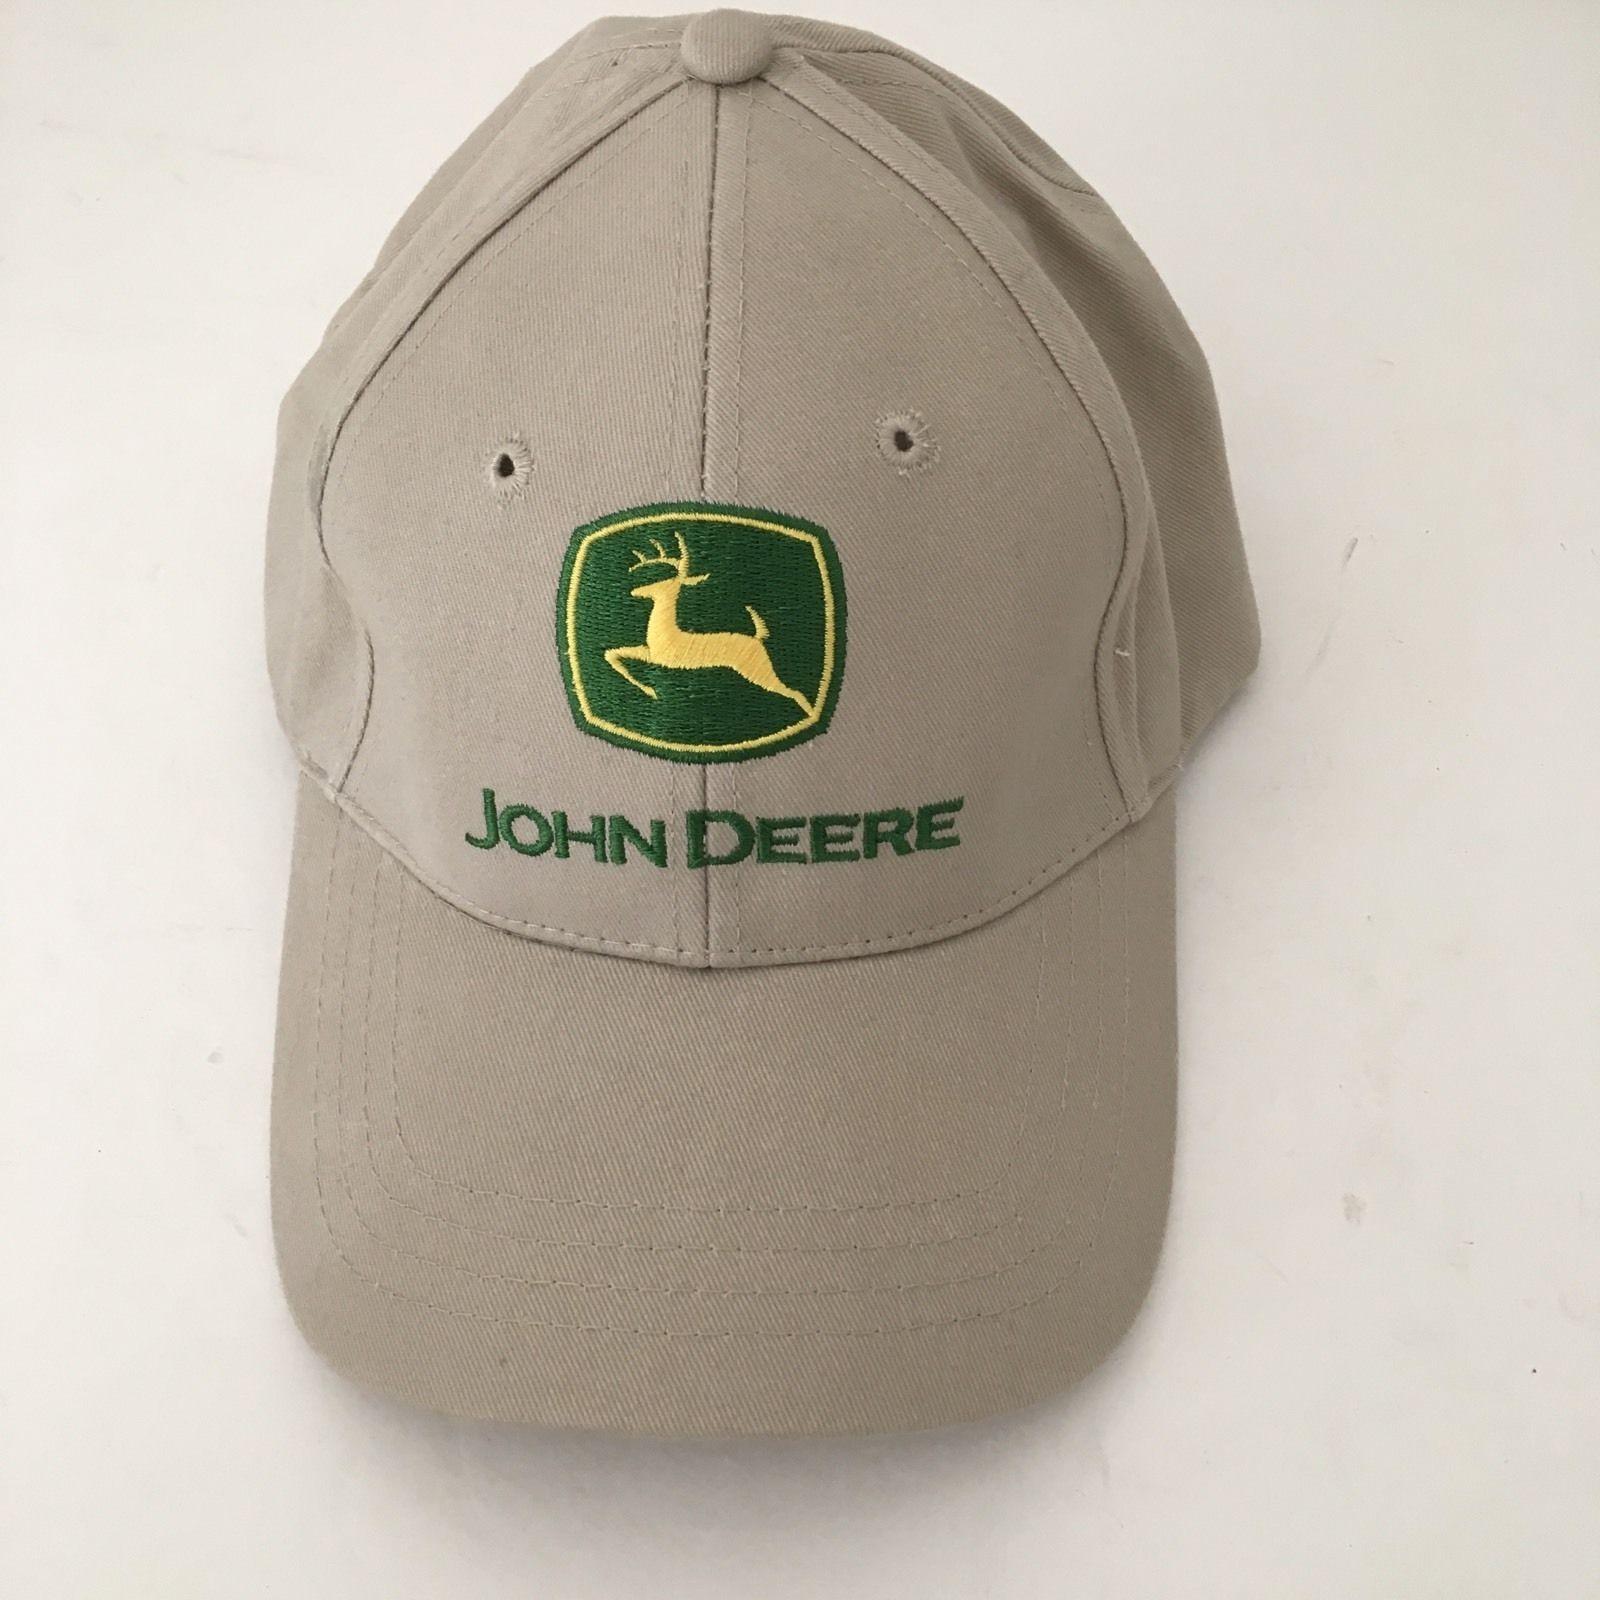 00f201bbbef John Deere nwot hat cap Cary Francis and 50 similar items. 57